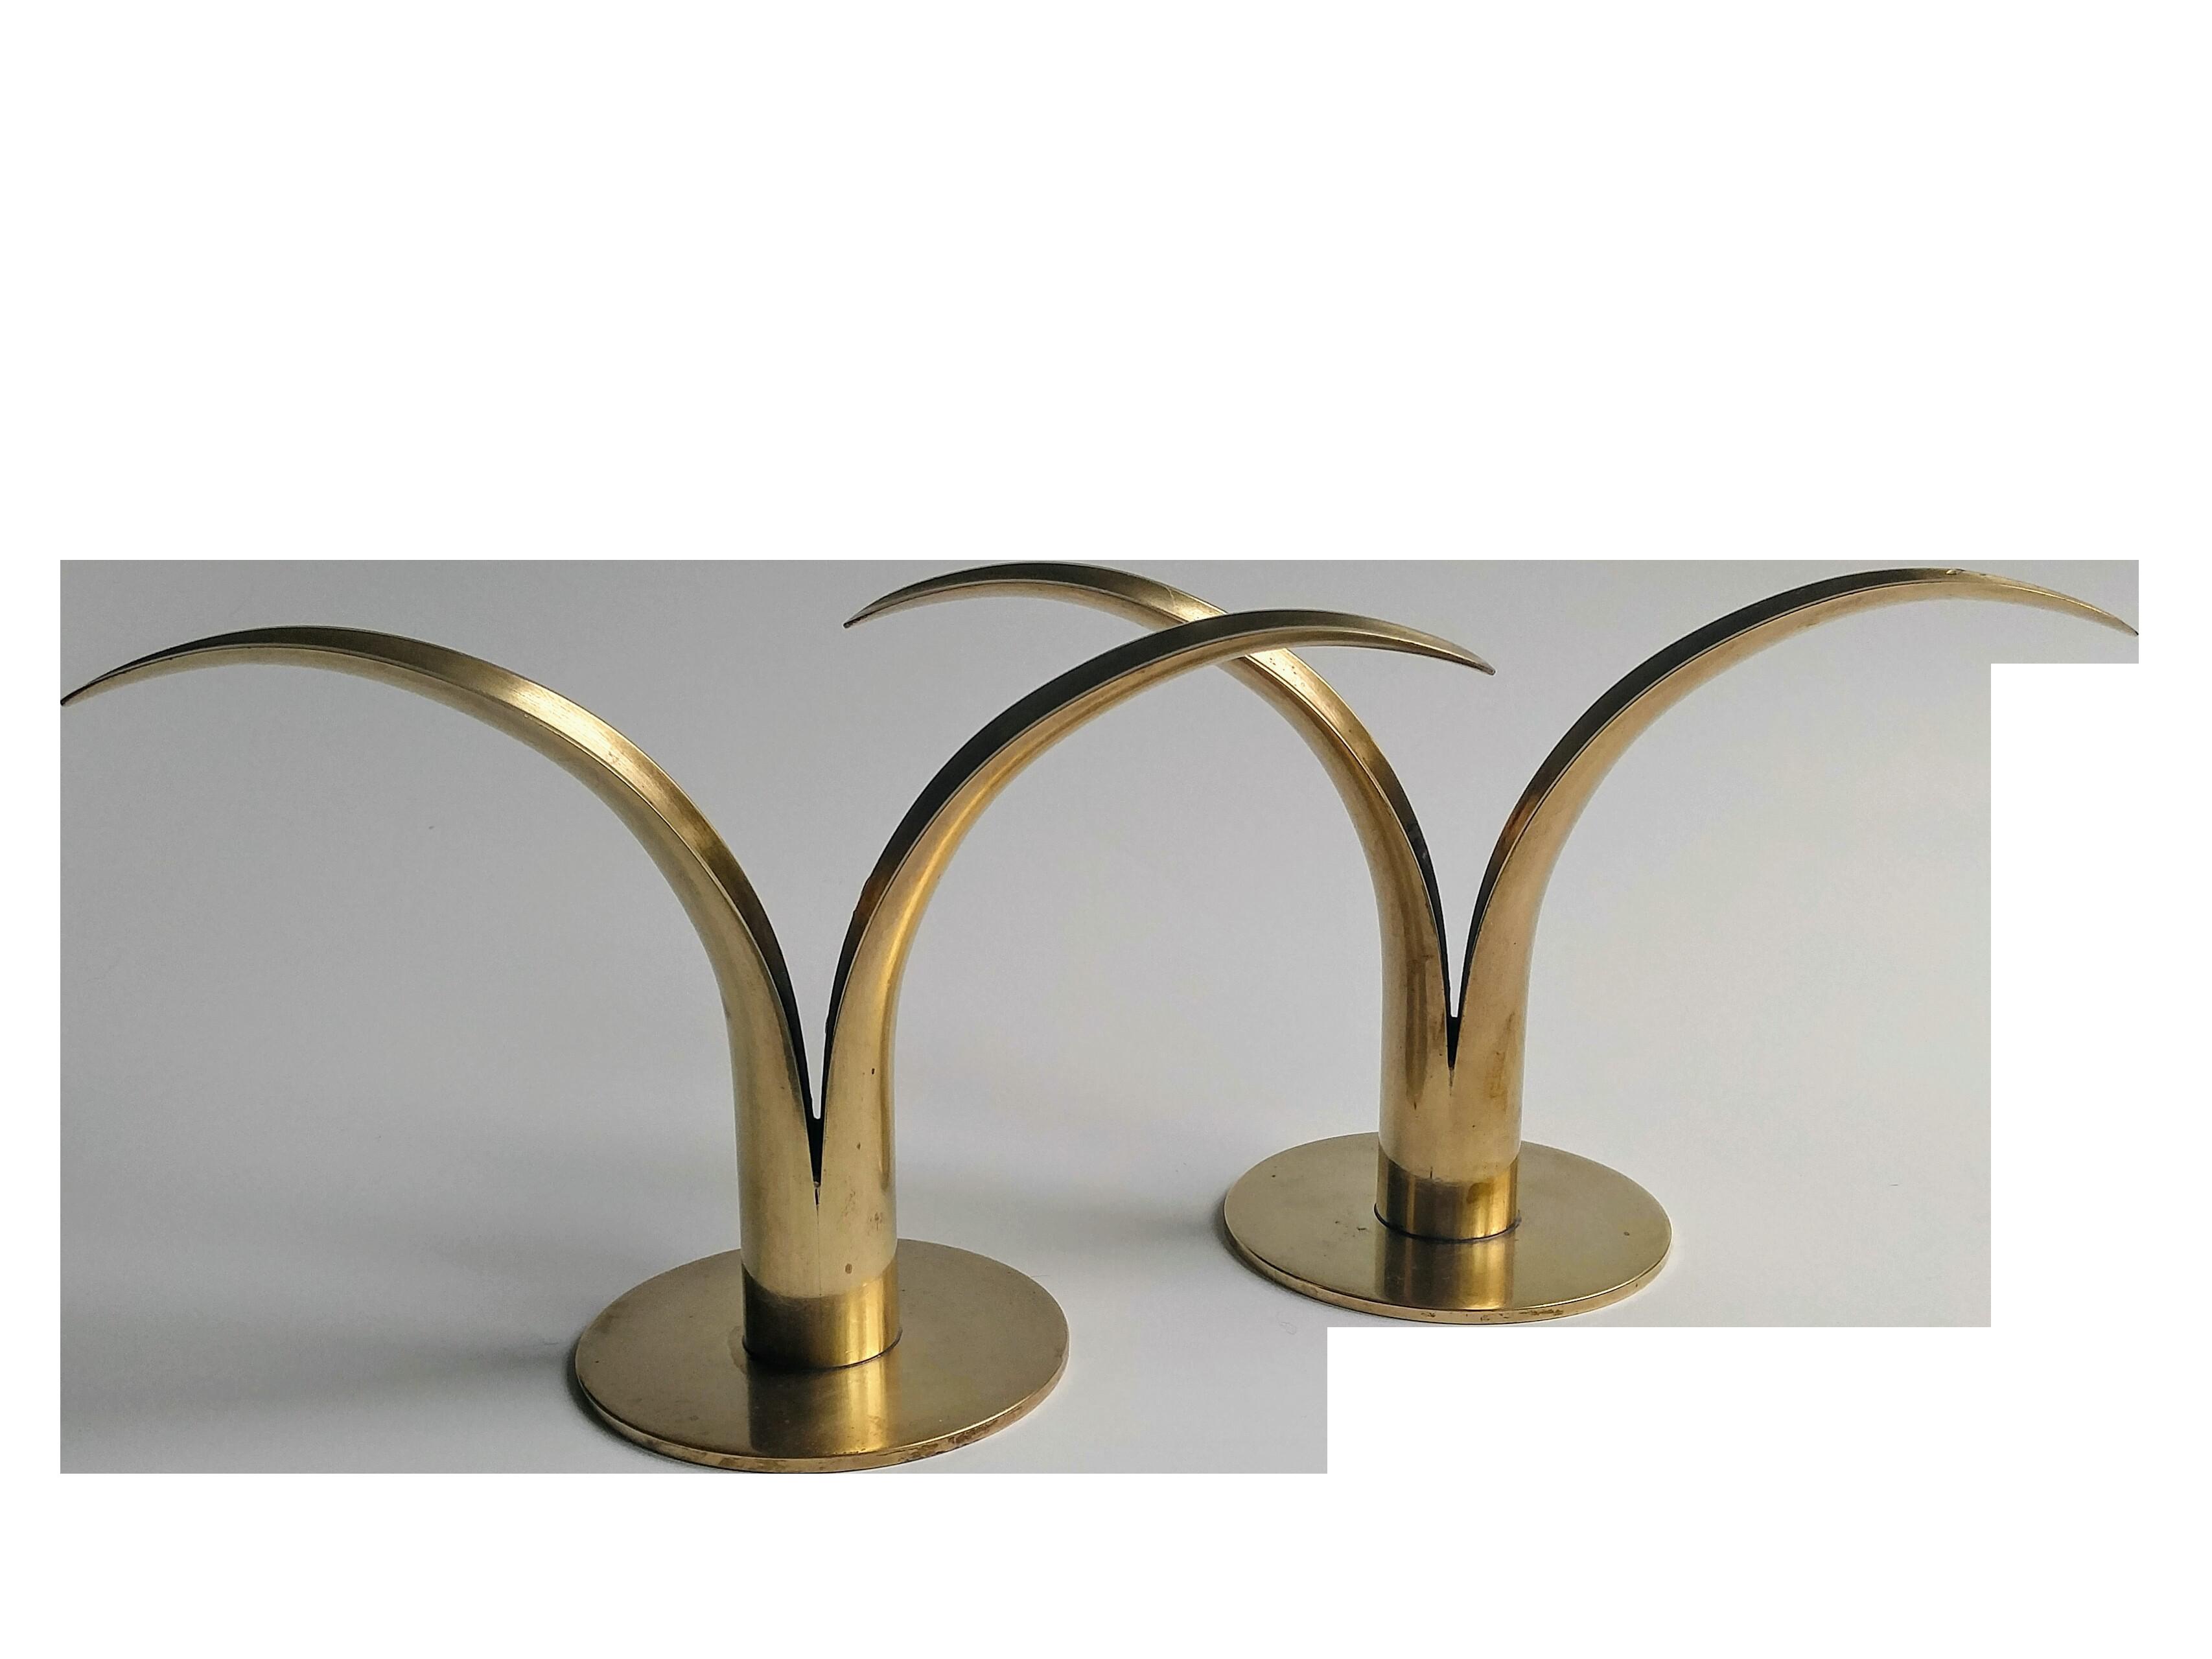 Midcentury ystad candle holders a pair mid century mid century